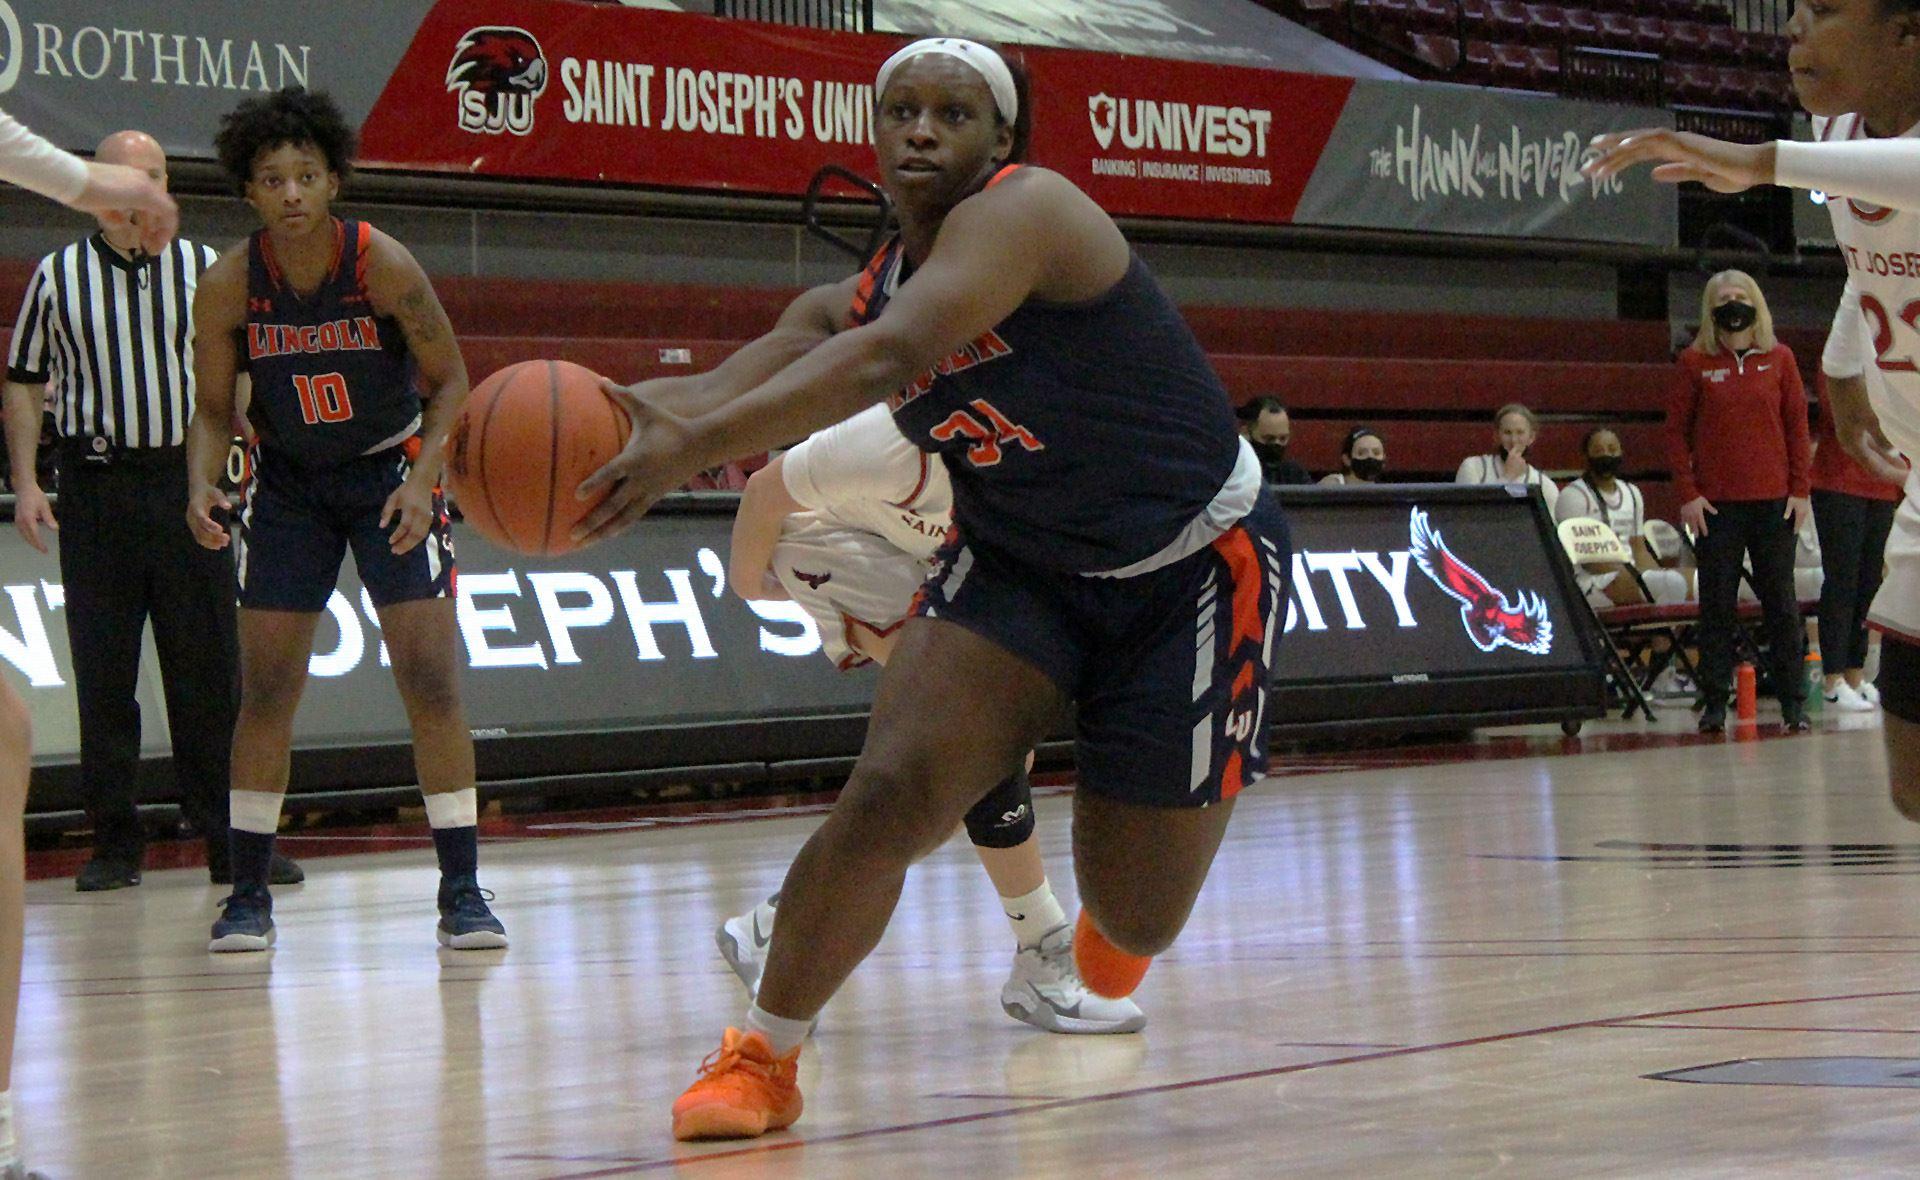 Lincoln (PA) women's basketball